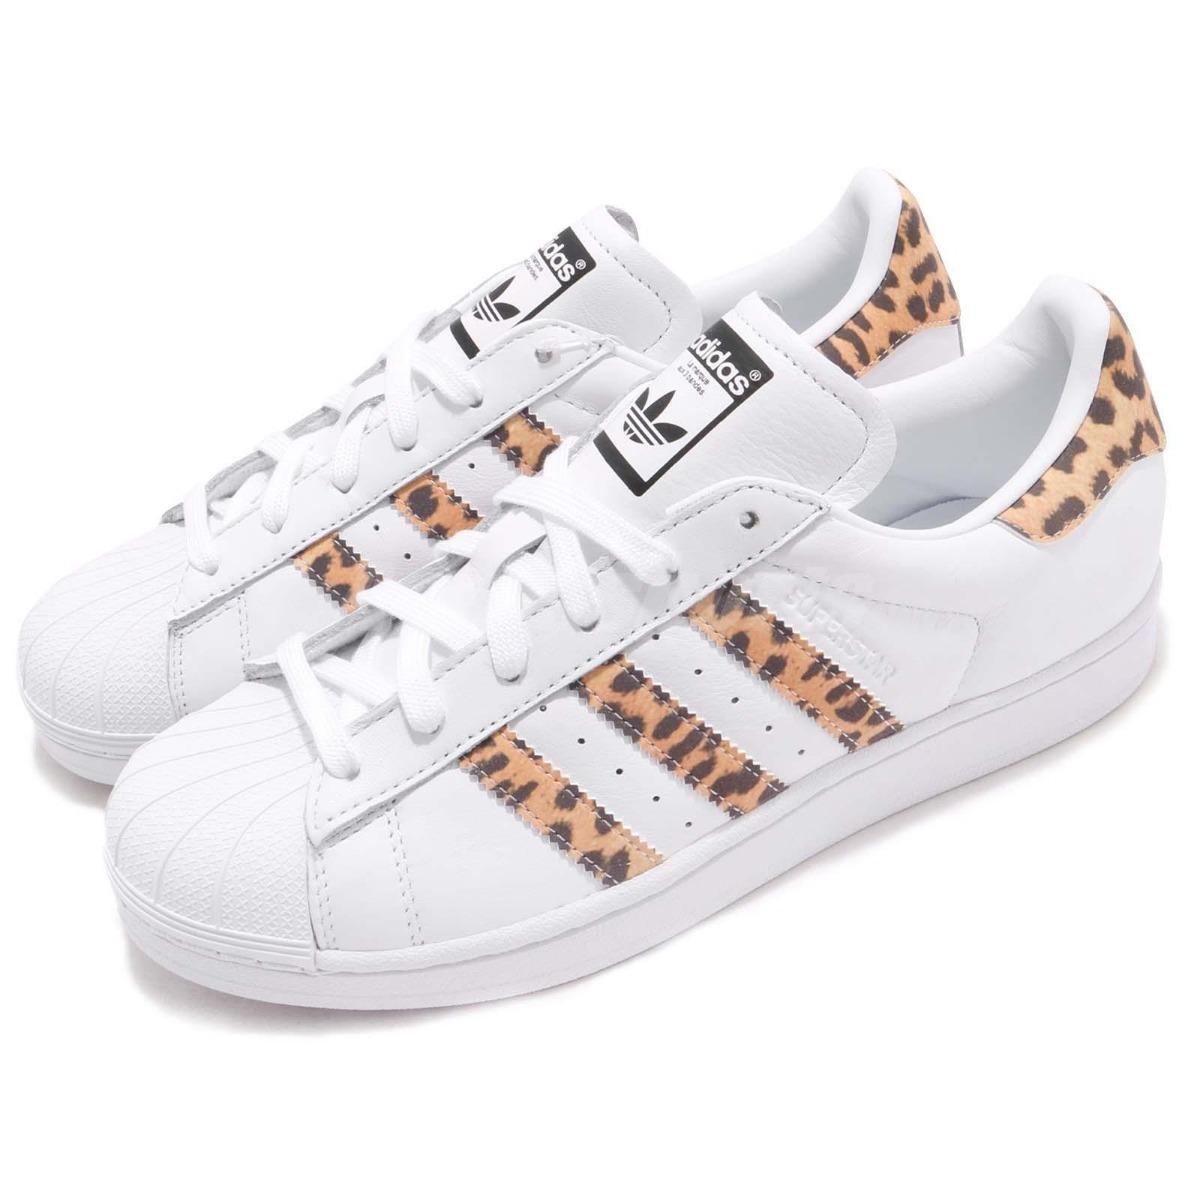 21a05216c5 Adidas Libre En Mercado MujerRaya Superstar 00 Animal Print1 499 nPym0wvN8O